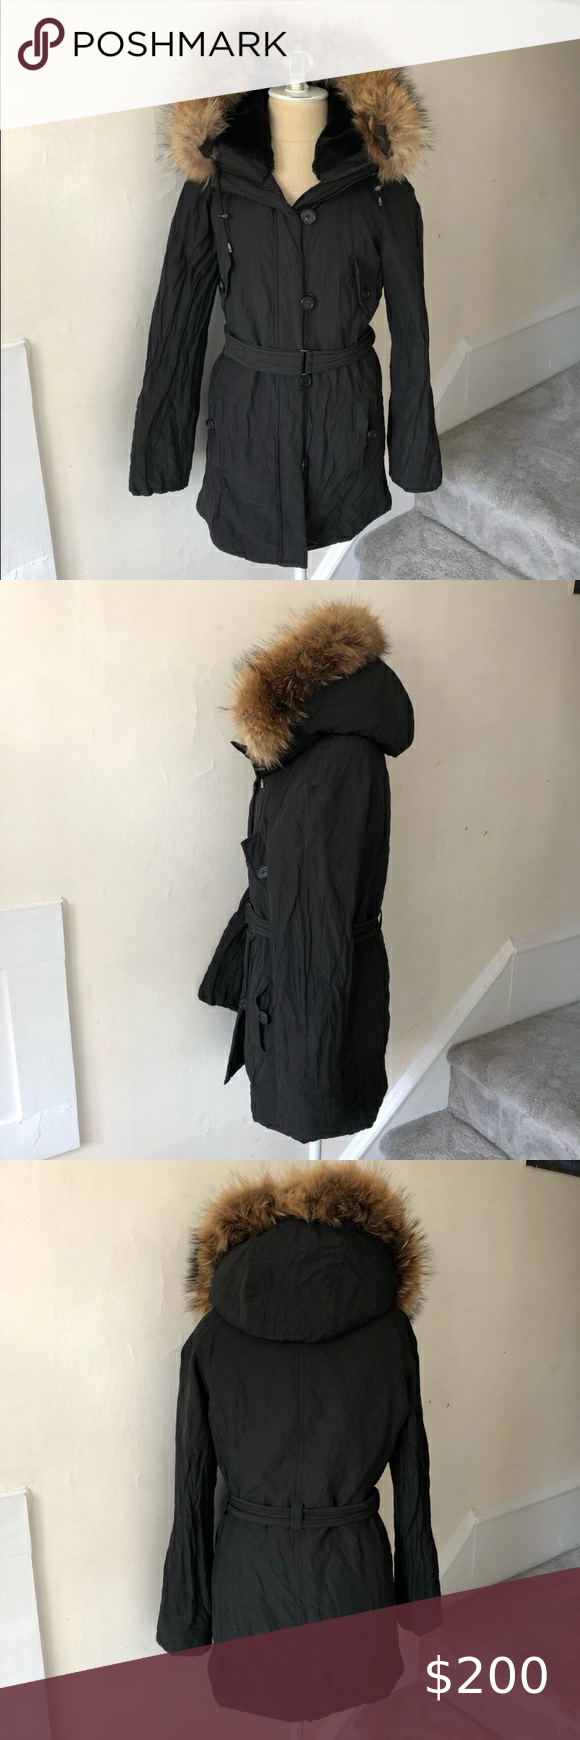 Vince Cotton Metal Fox Fur Trim Hooded Puffer Coat In 2021 Puffer Coat Faux Fur Trim Coat Down Puffer Coat [ 1740 x 580 Pixel ]